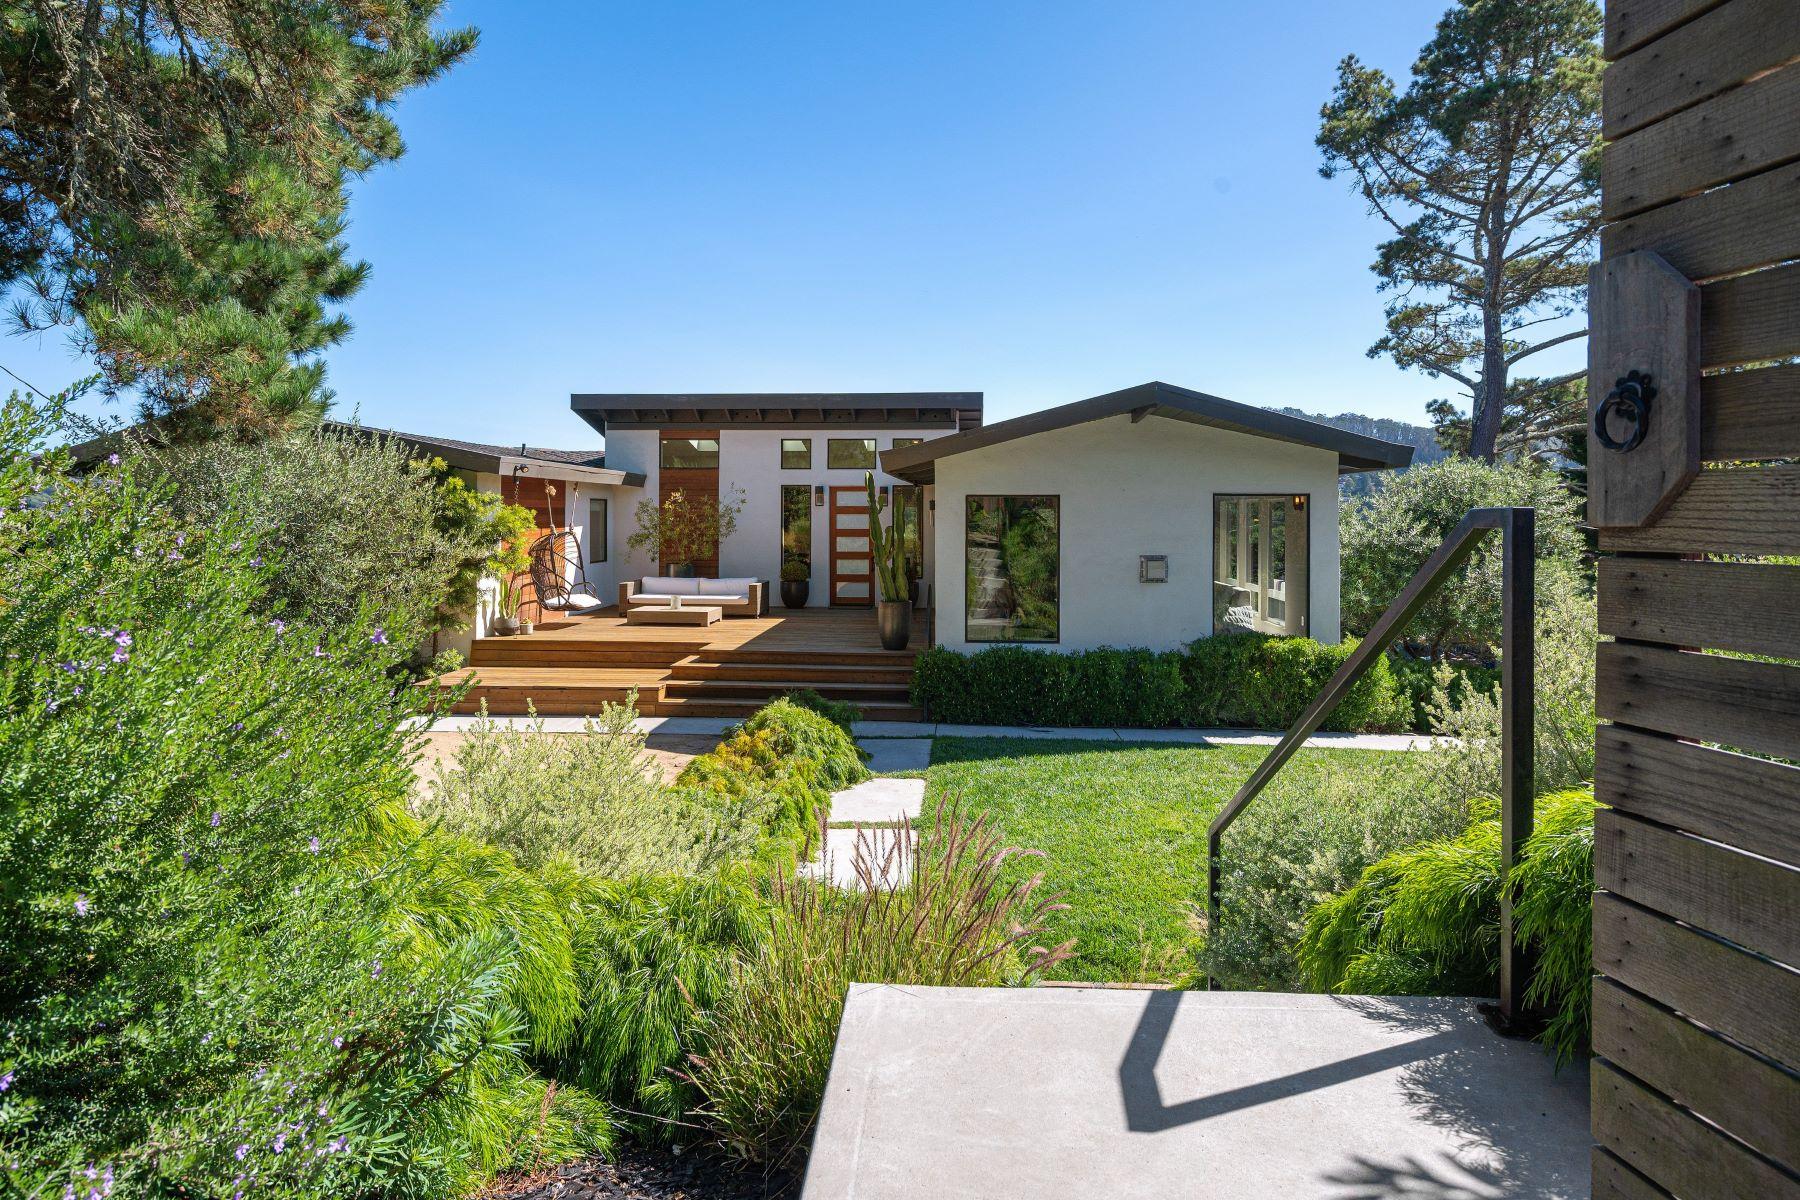 Single Family Homes pour l Vente à Dazzling Remodeled Entertainers Home 112 Peralta Avenue, Mill Valley, Californie 94941 États-Unis